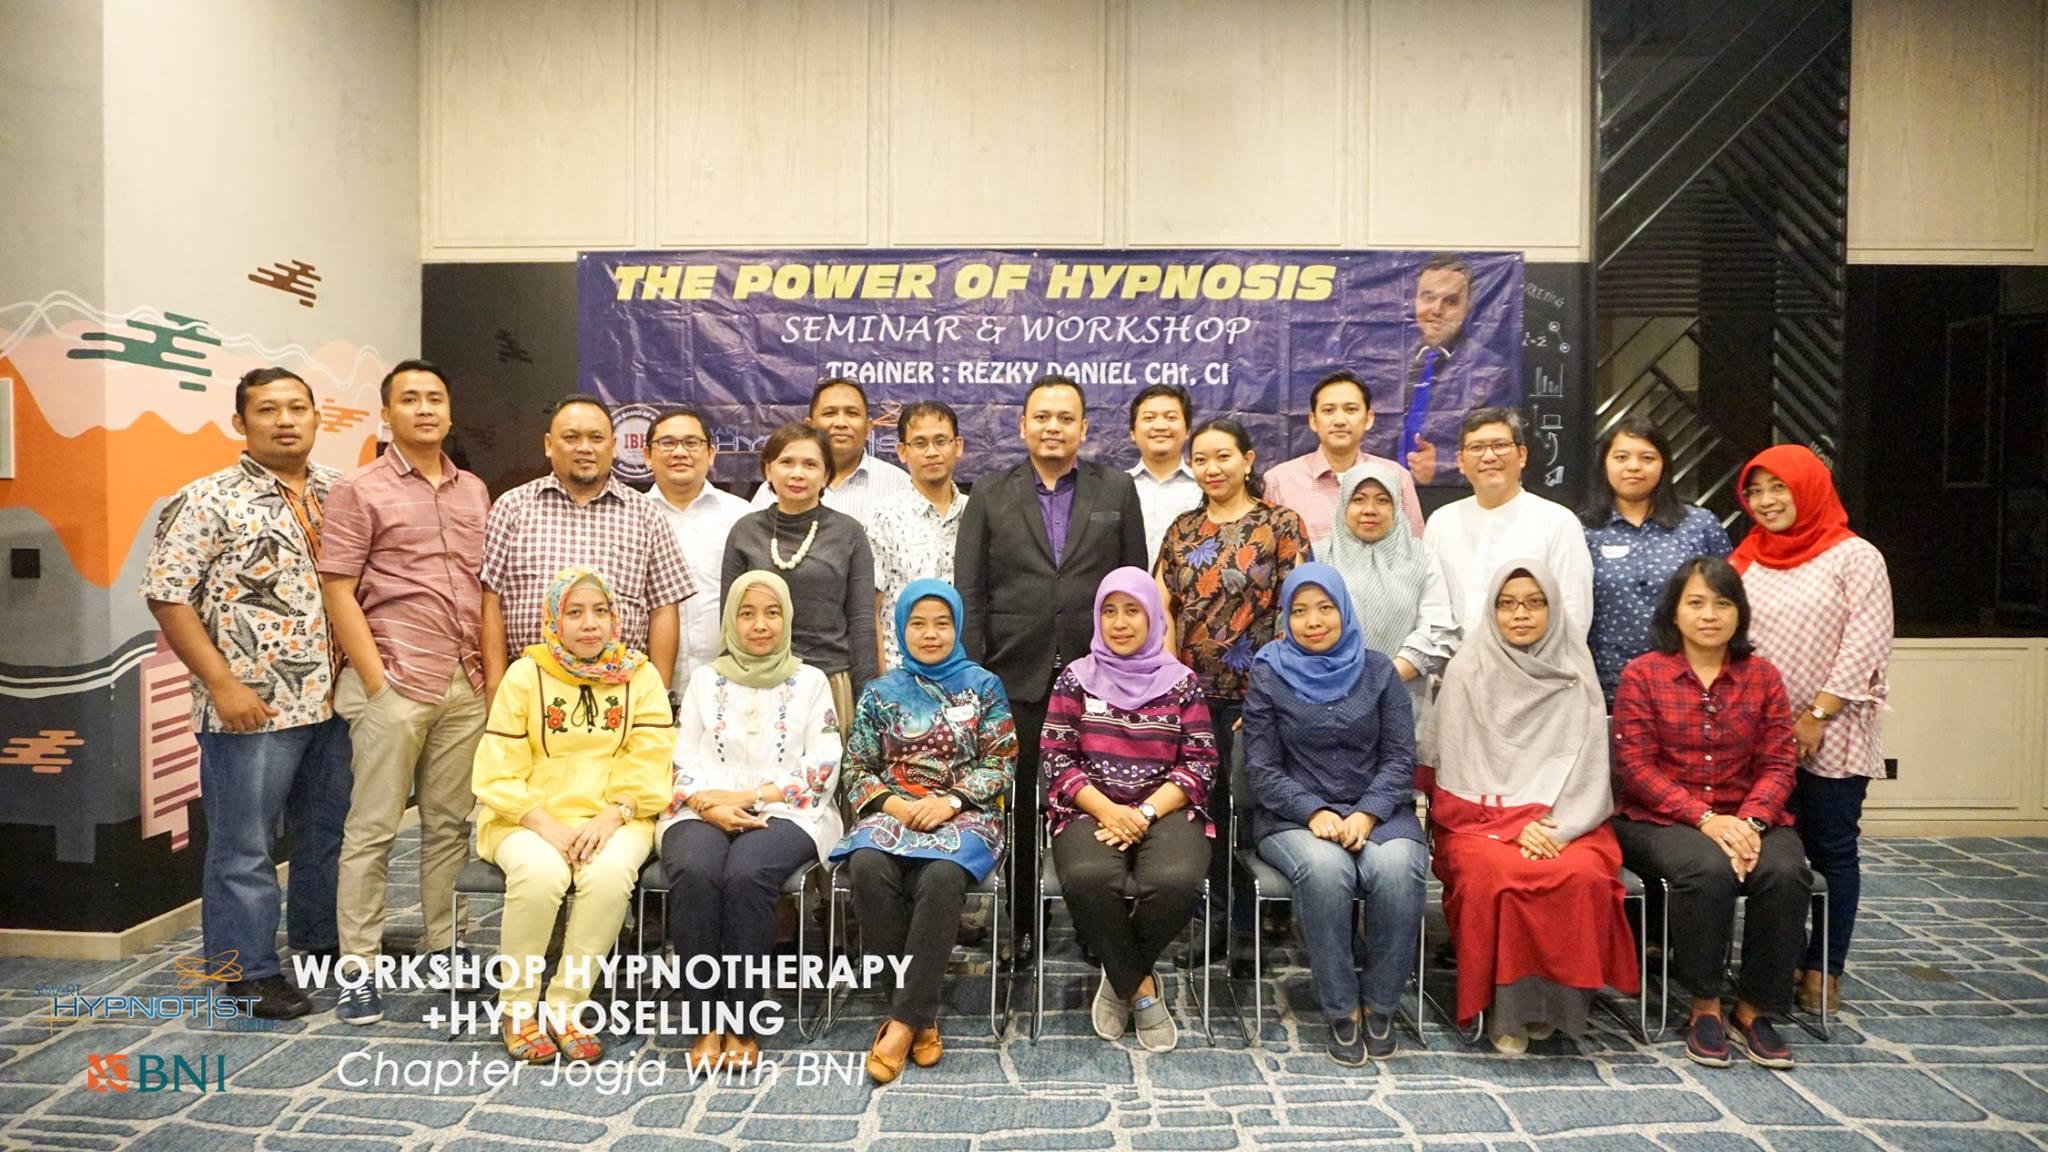 Dokumentasi Workshop Hypnotherapy bni